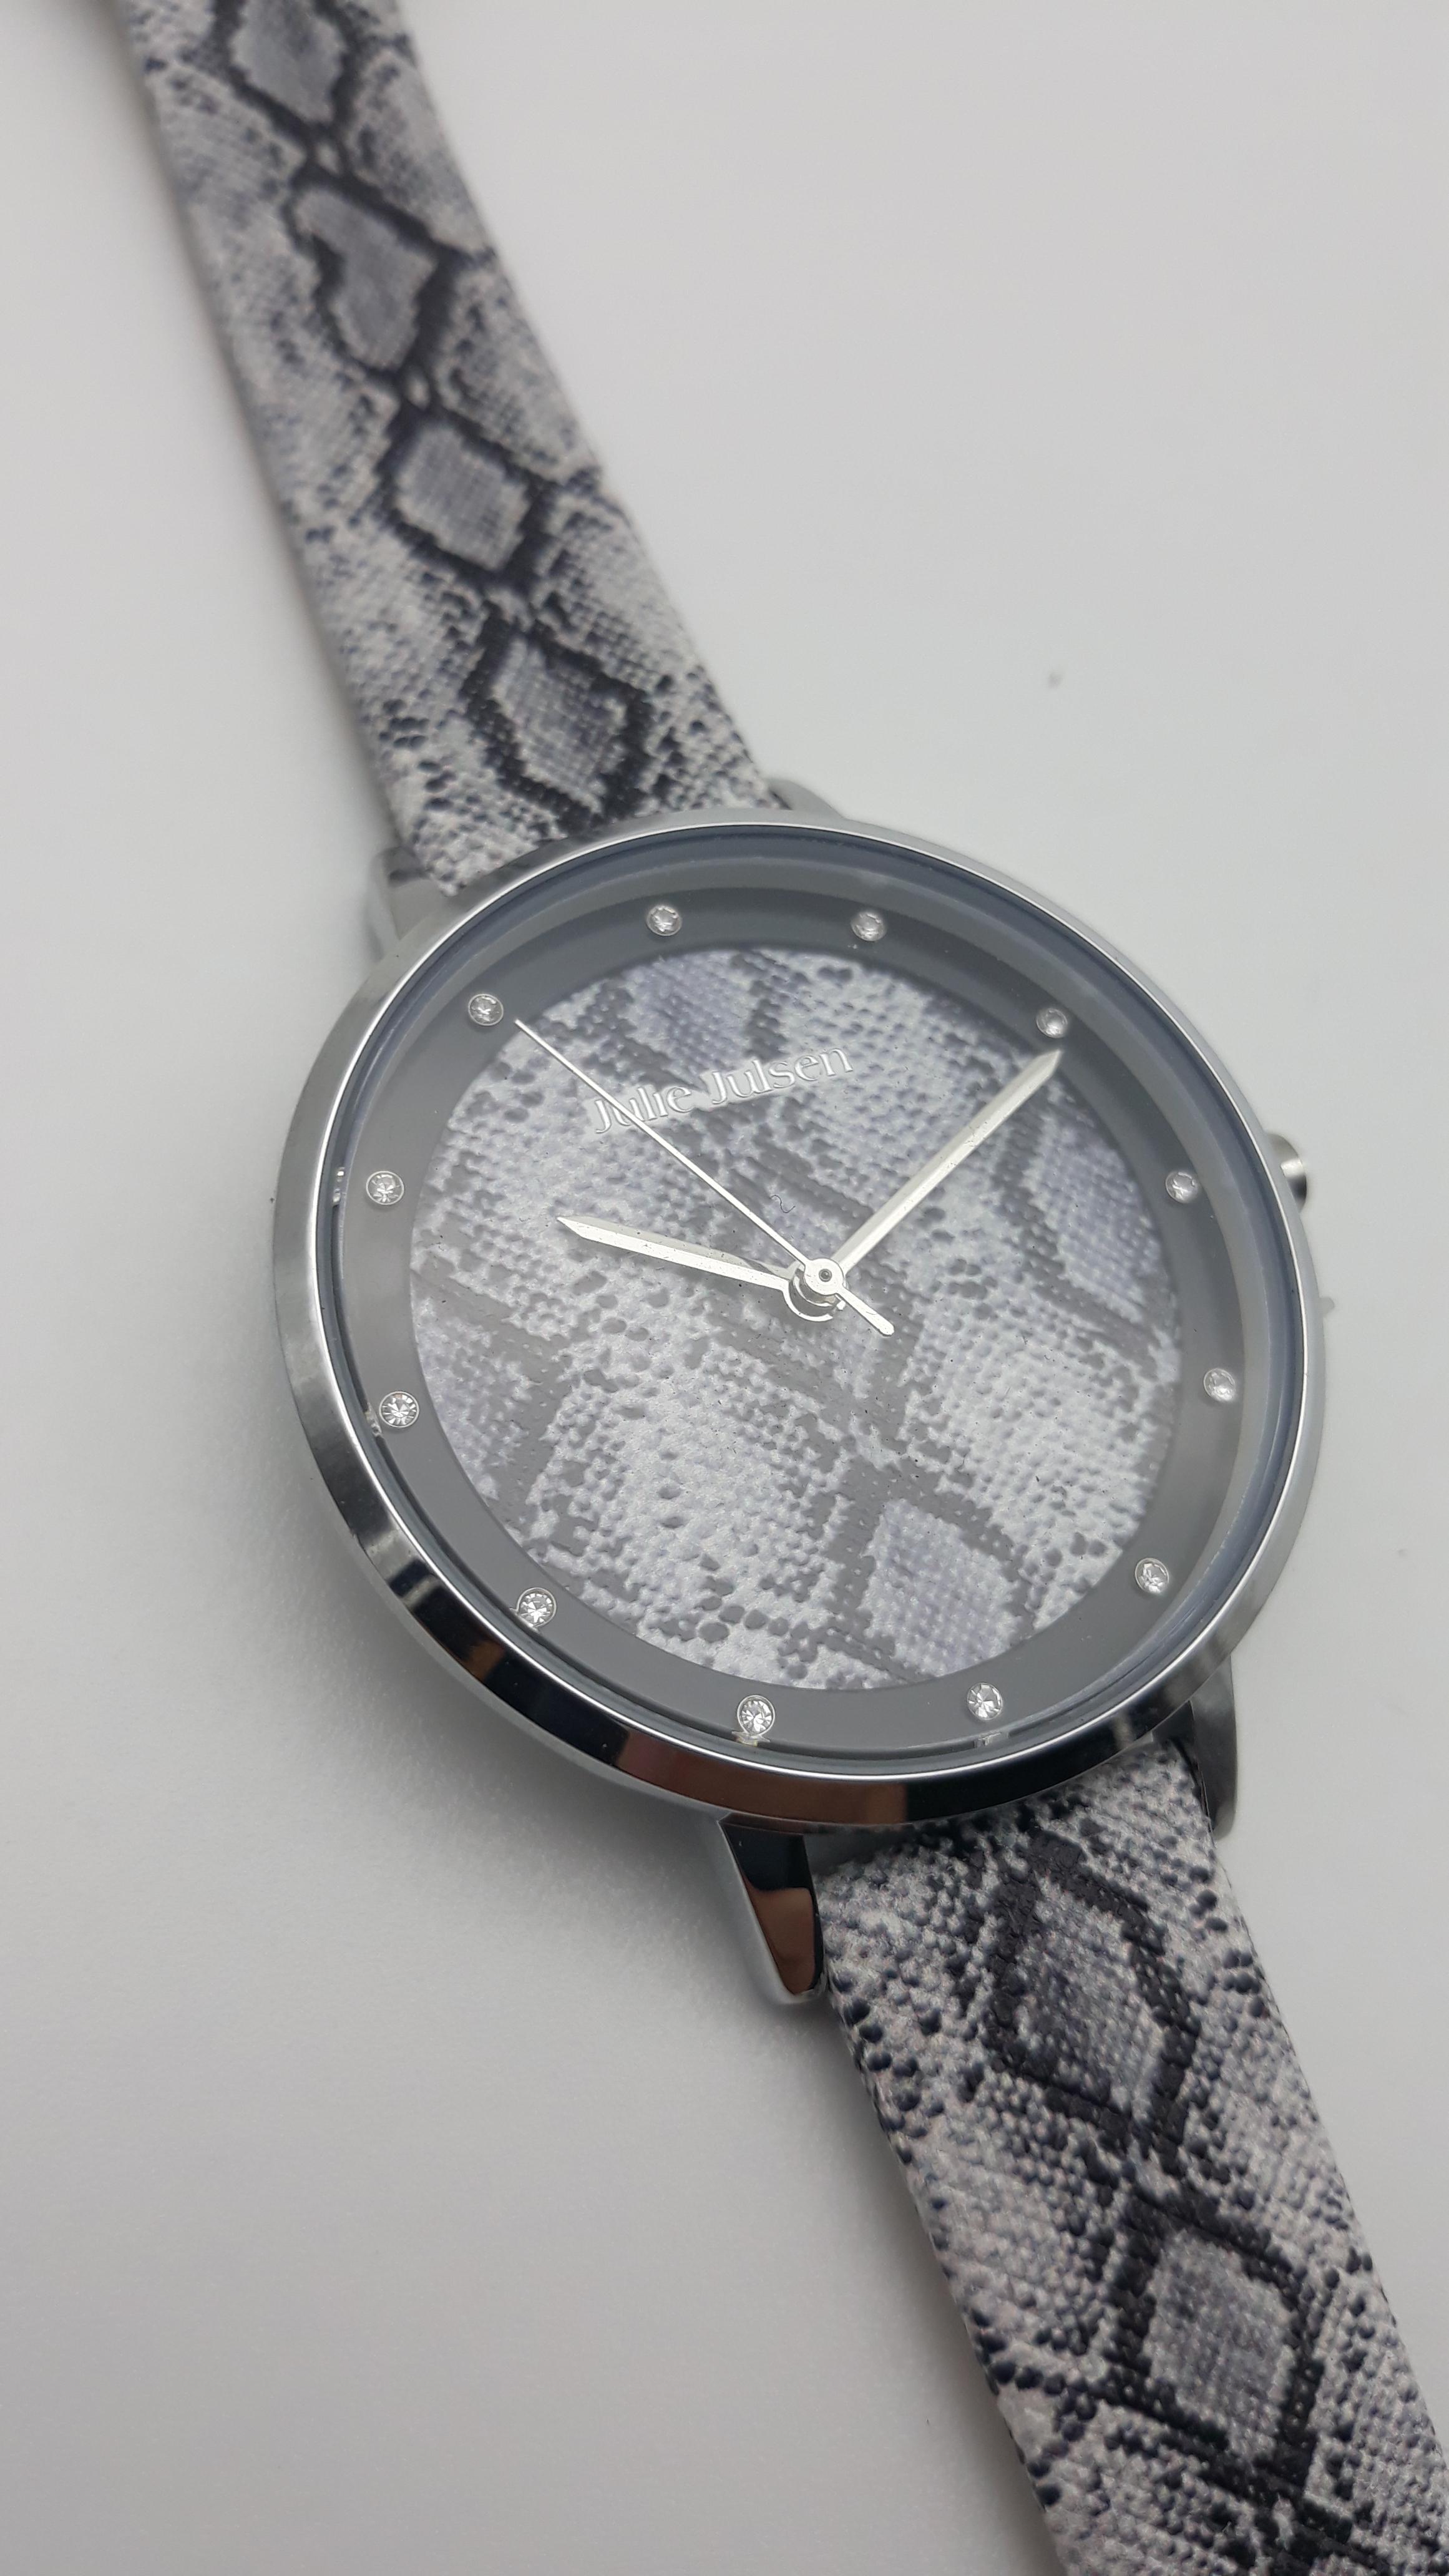 Orologio Donna Julie Julsen JJW1203SL-P Safari Python, vendita on line | OROLOGERIA BRUNI Imperia